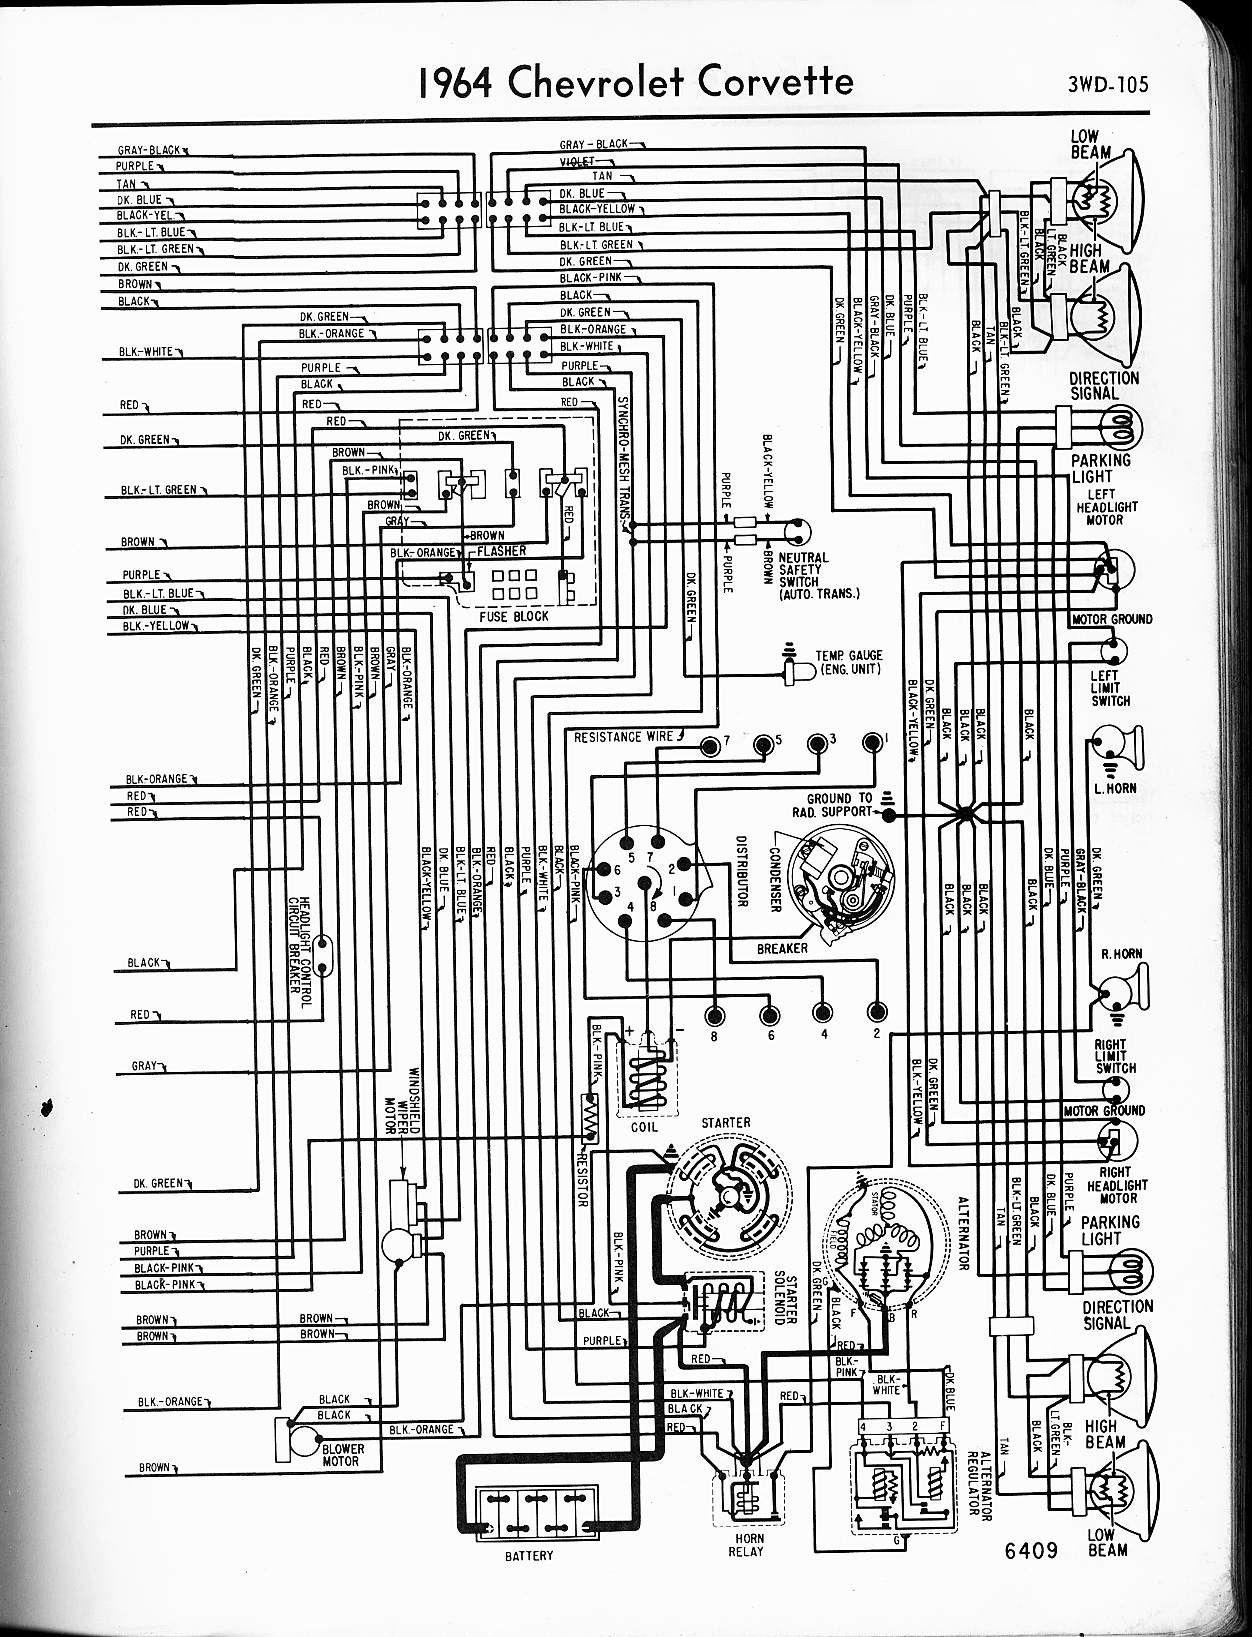 1970 Chevy Truck Wiring Diagram In 2021 Diagram Chevy Trucks Car Stereo Wiring Diagram